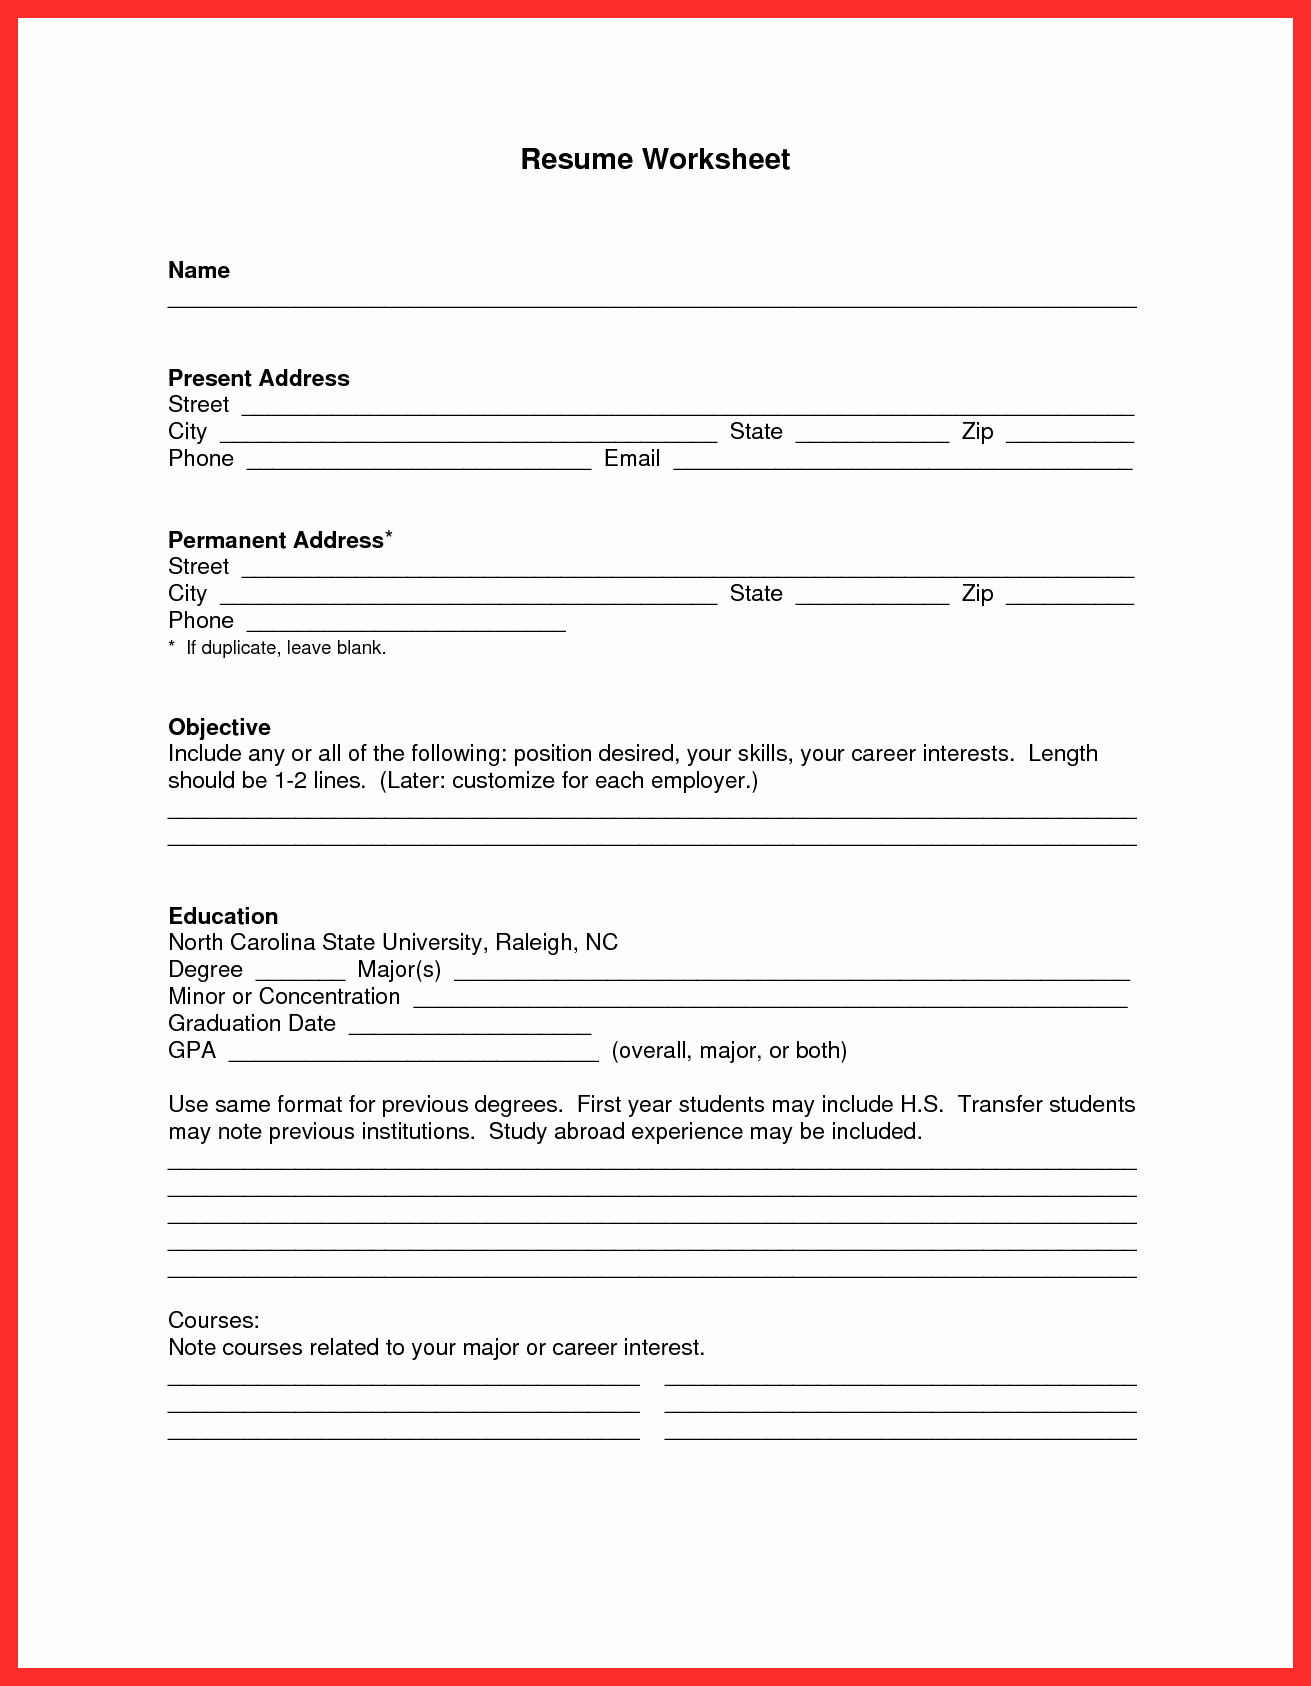 Free Resume Templates Download Pdf Lovely Apa Resume Template